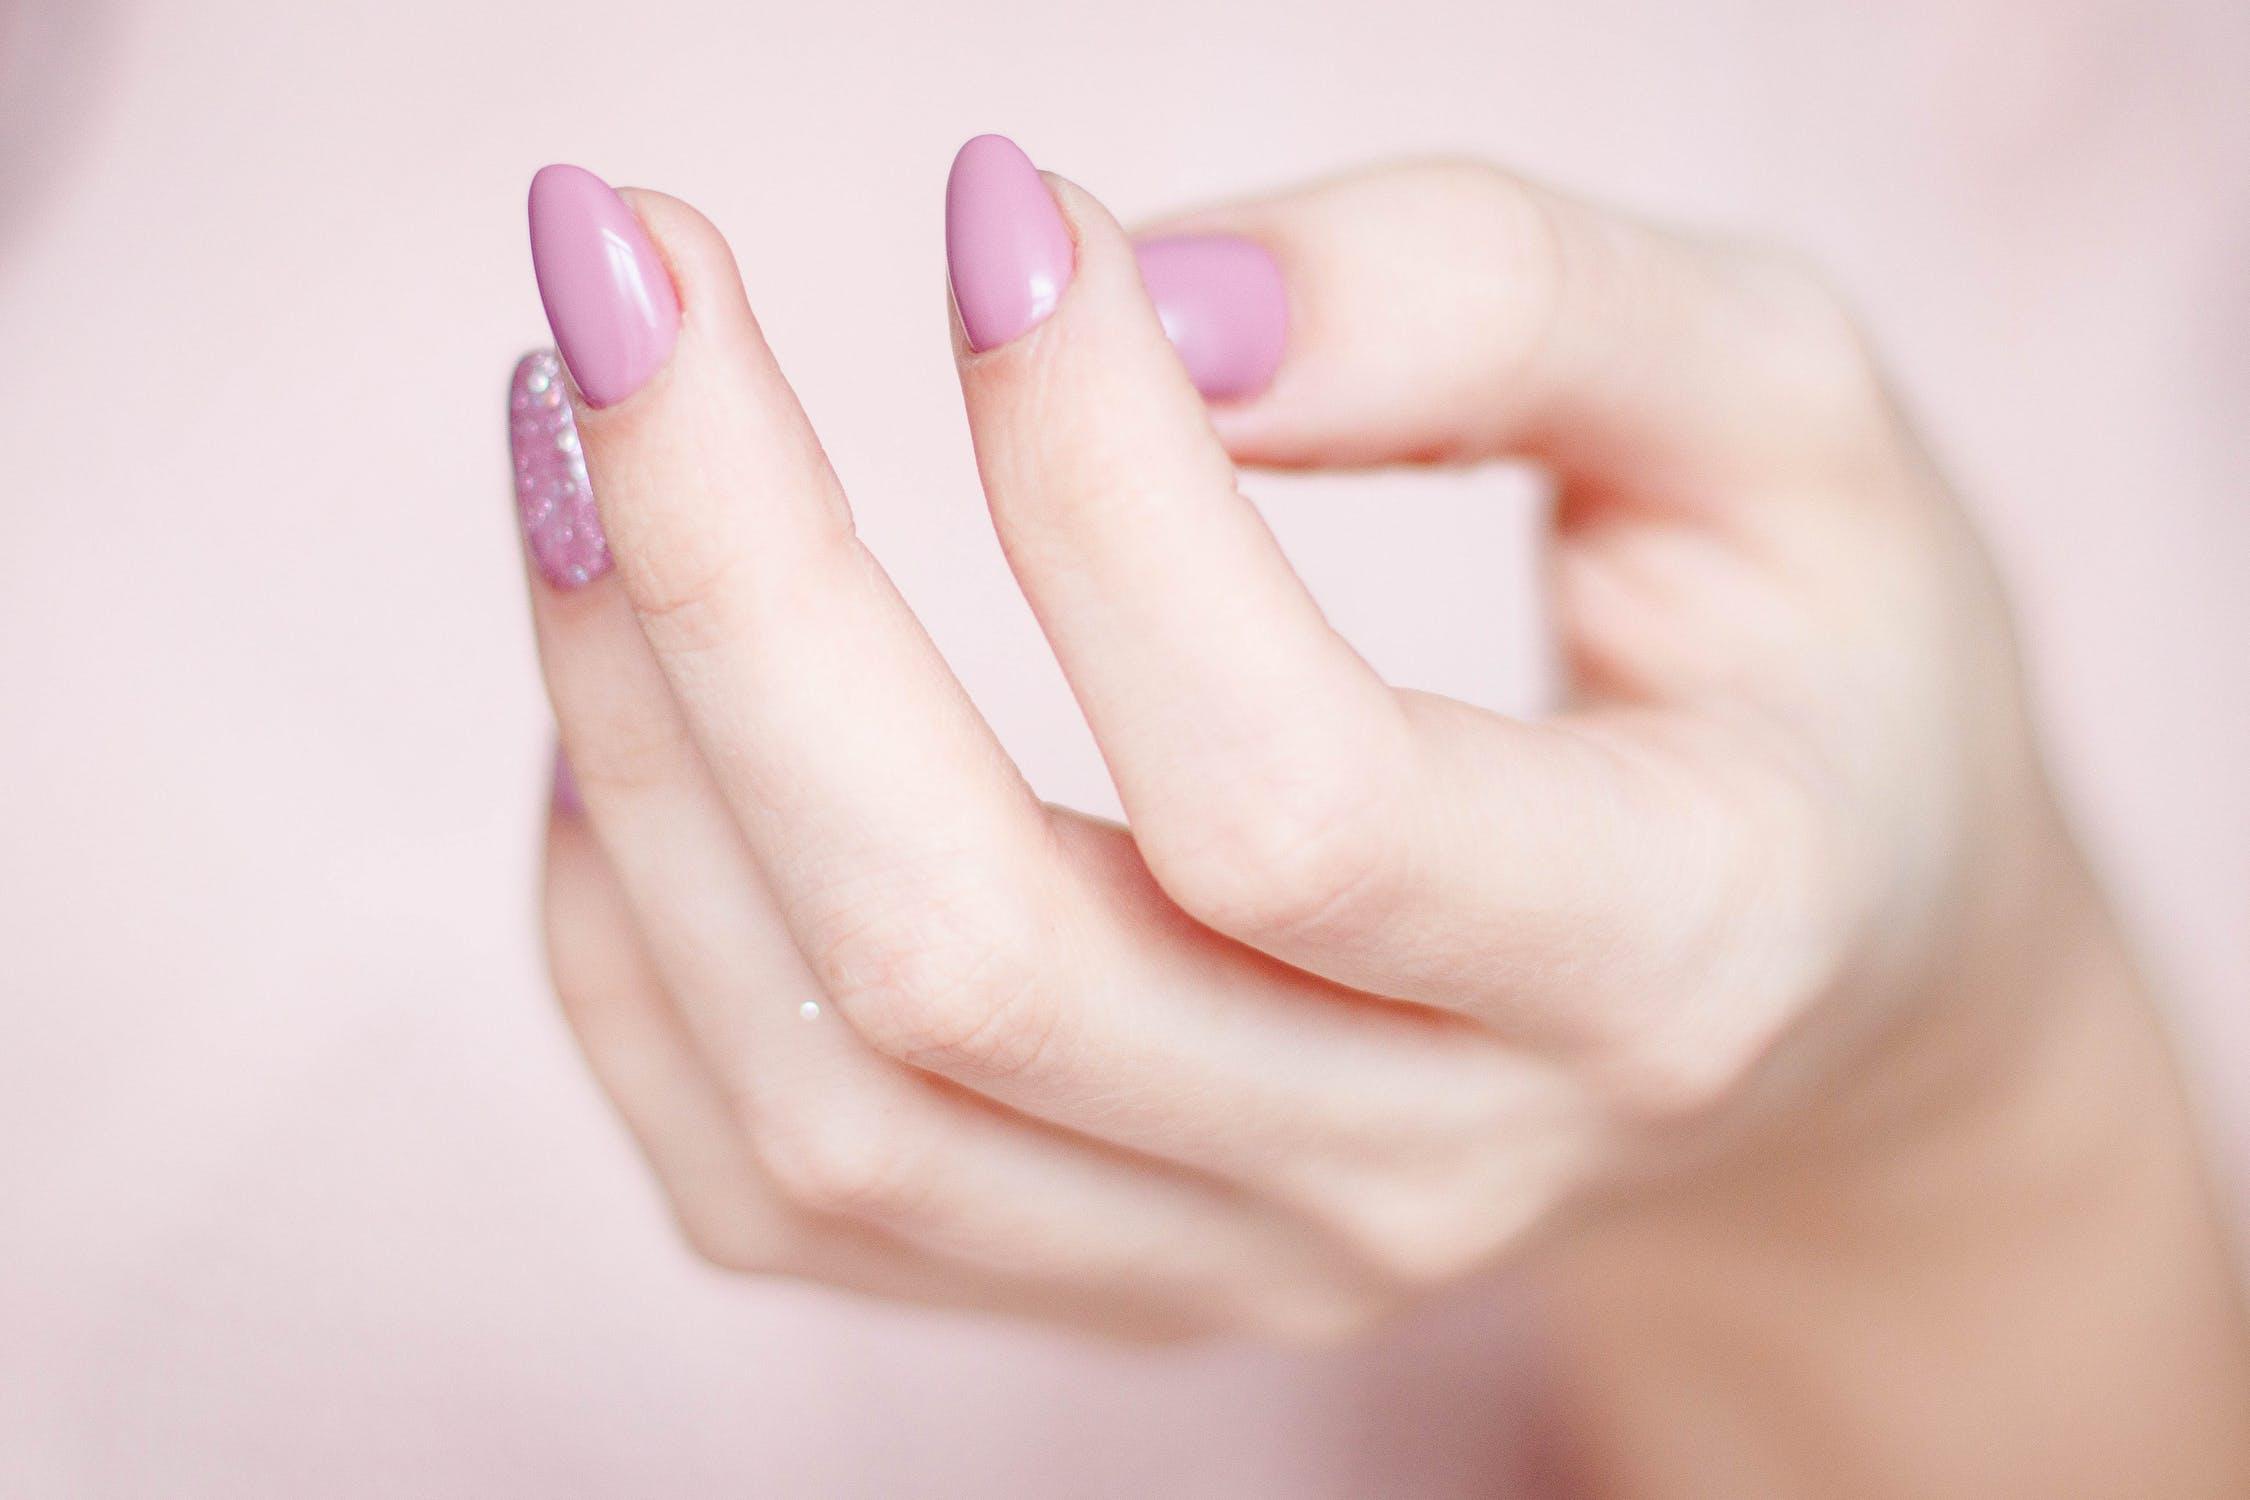 5 Tips for At-Home Nail Health